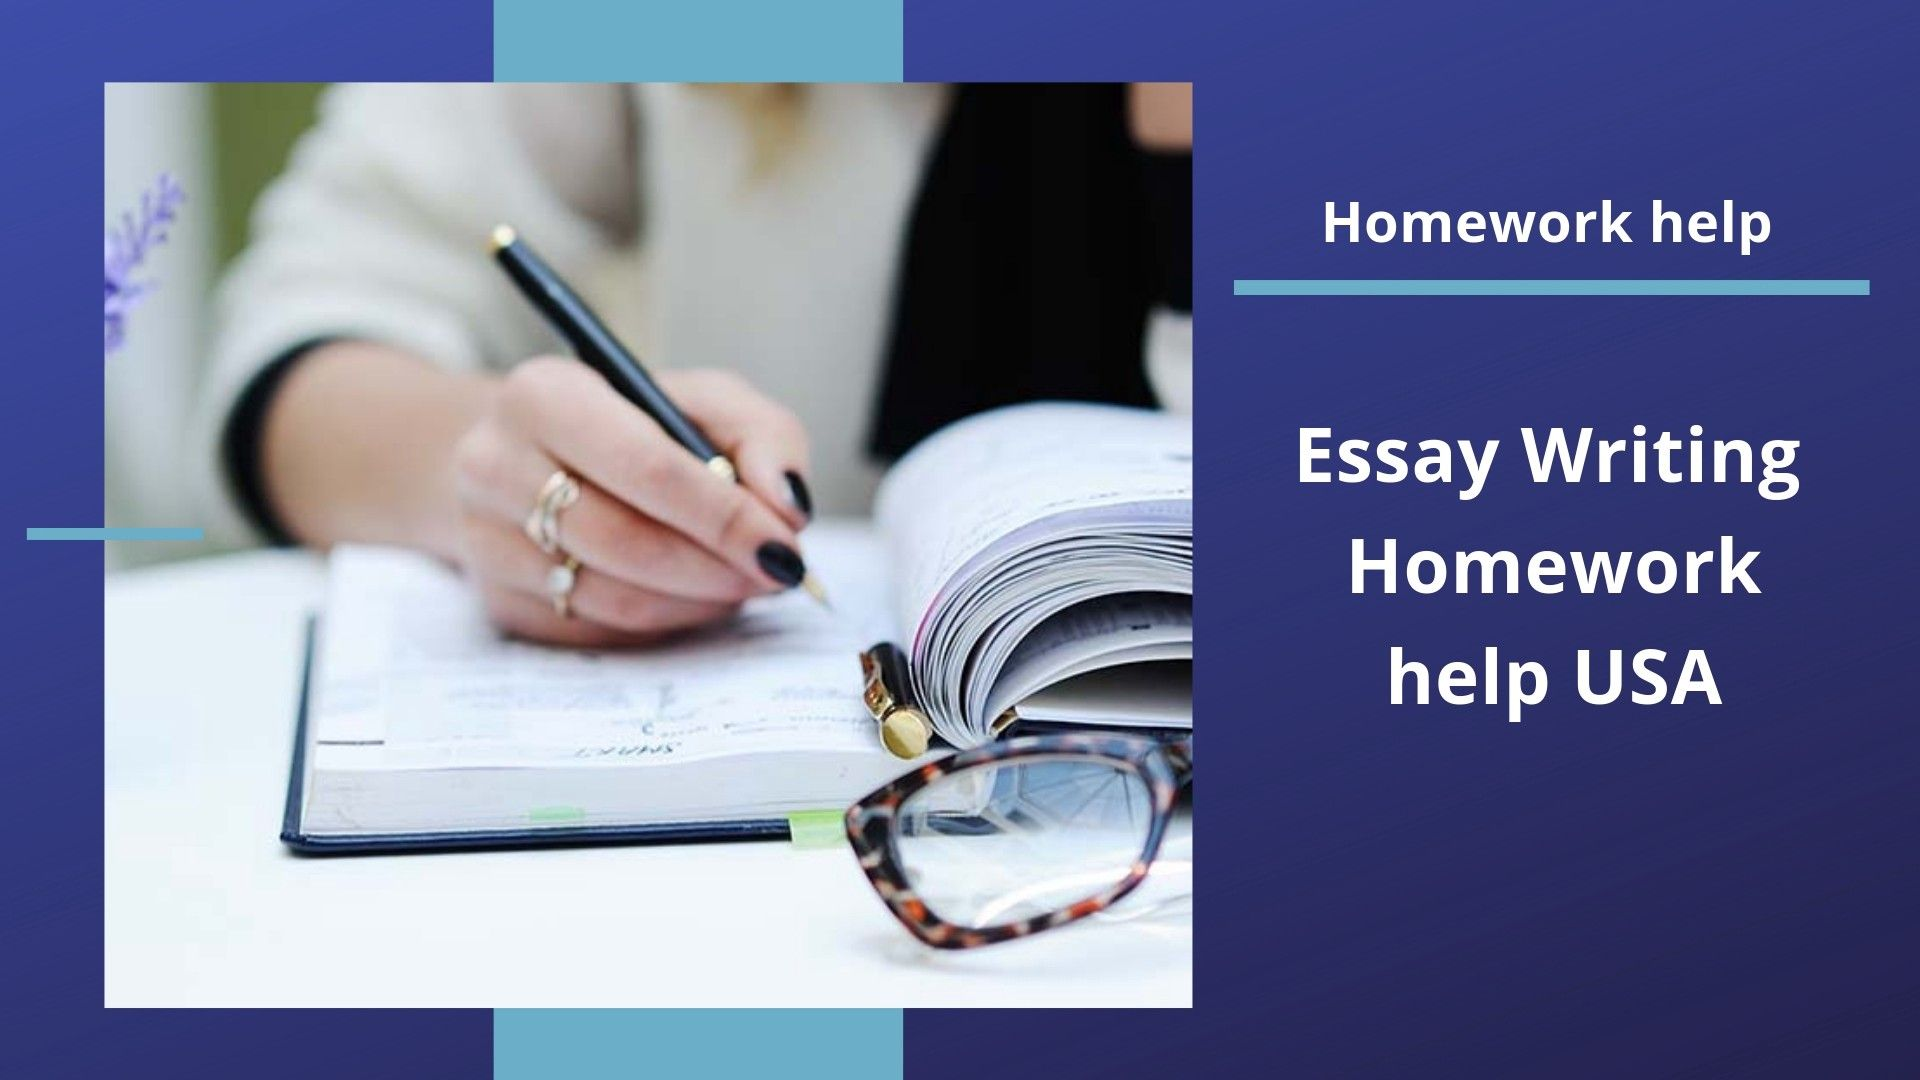 Writing Homework Help